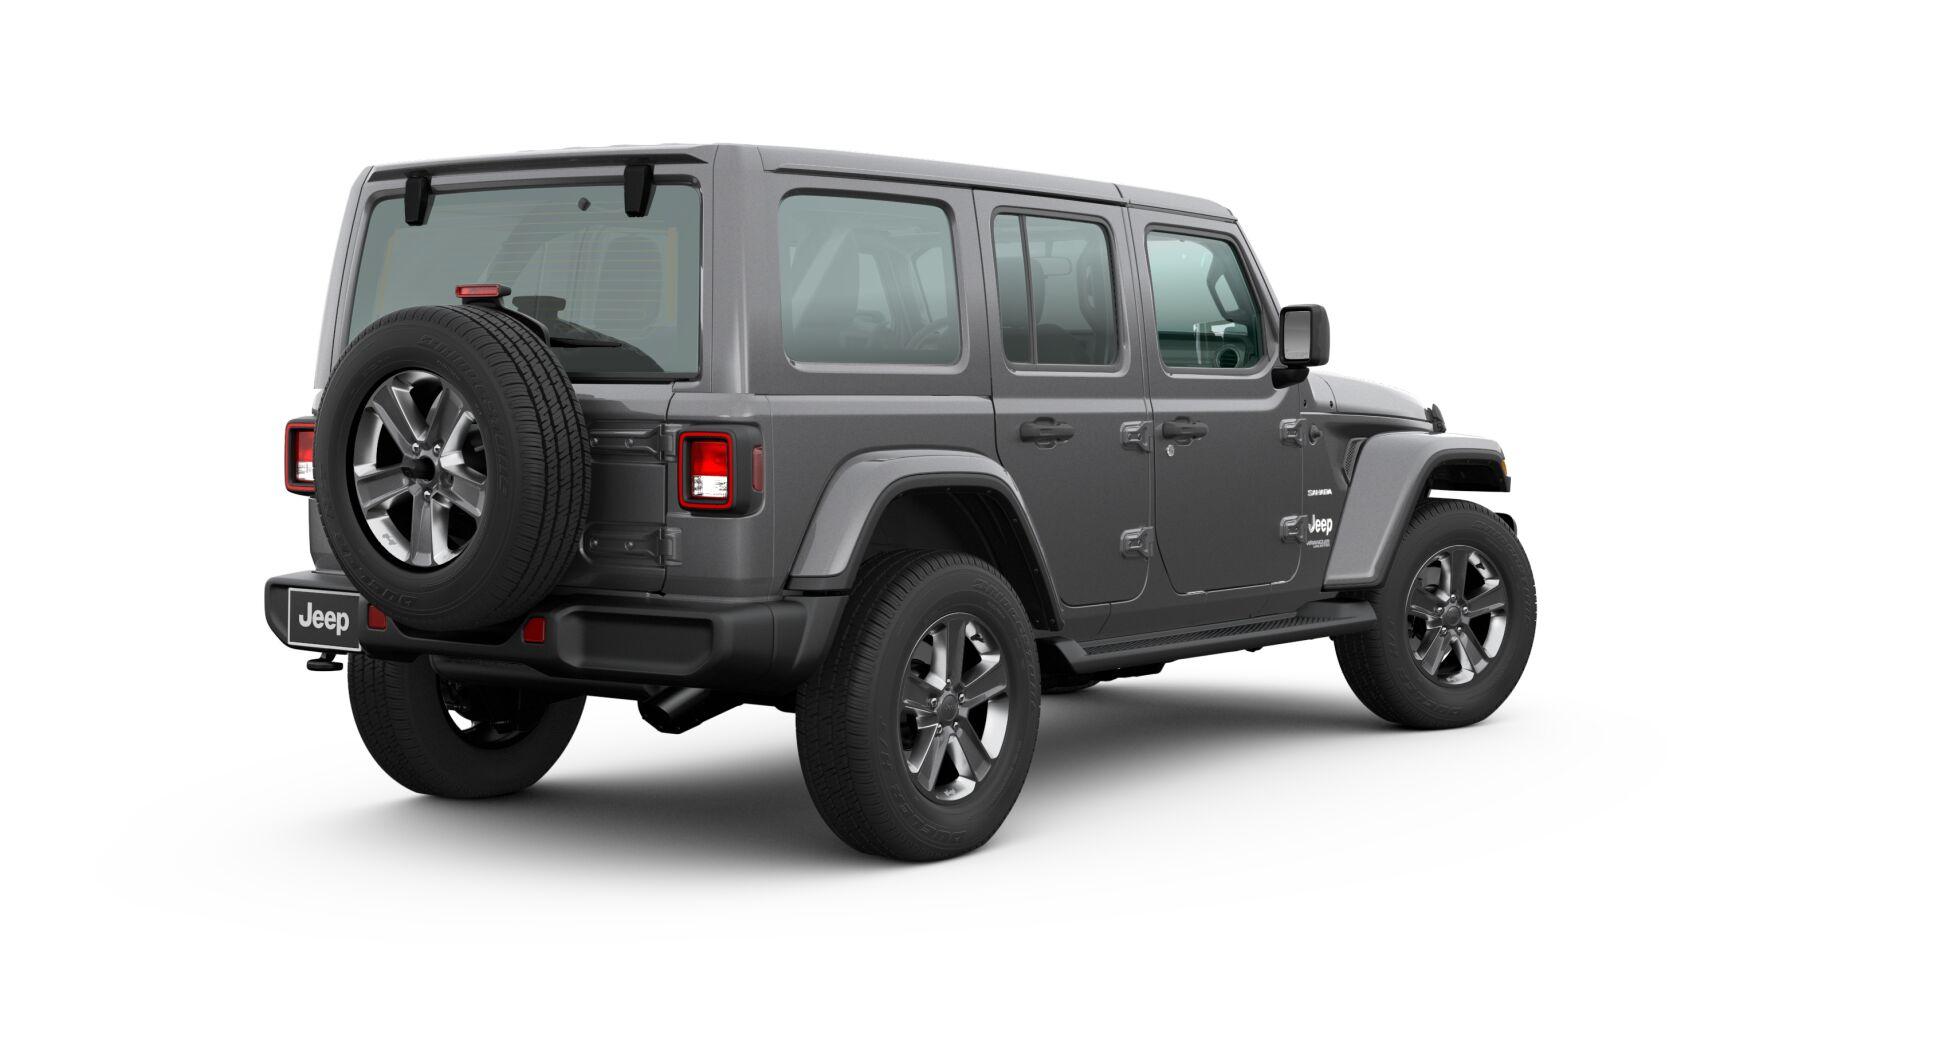 2020 Jeep Wrangler hard top up